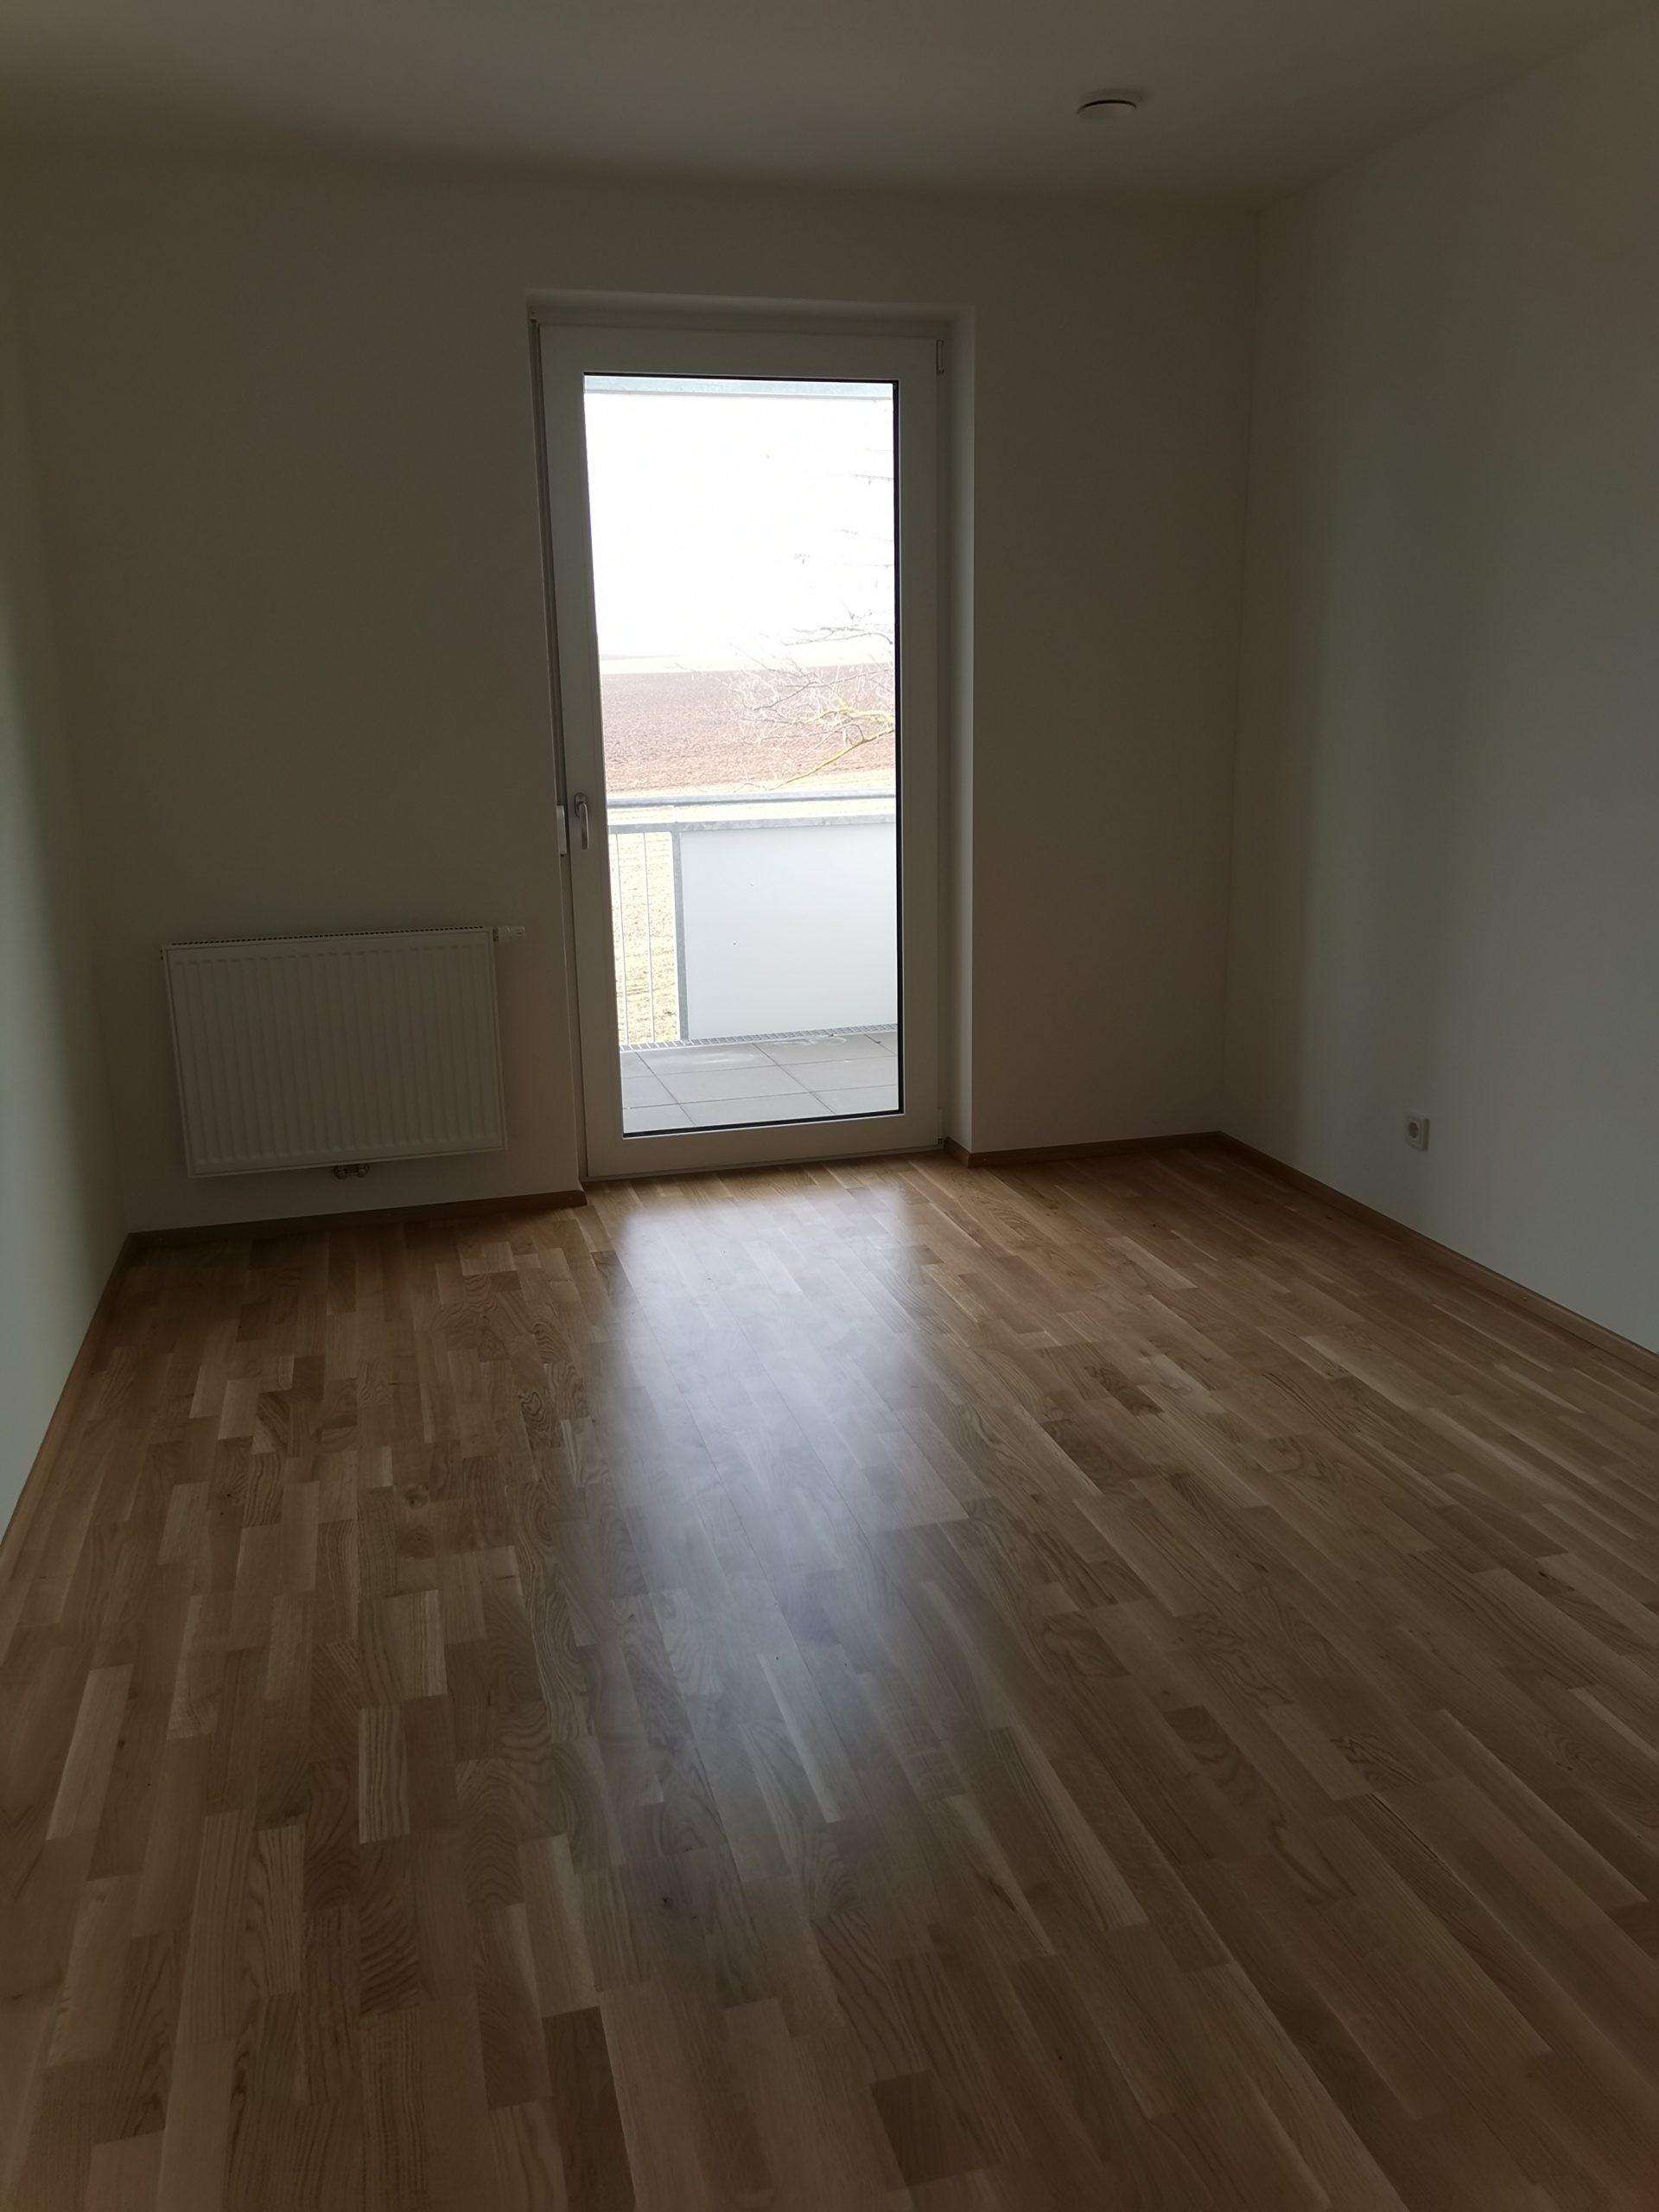 Immobilie von Kamptal in 3730 Eggenburg, Horn, Eggenburg VII - Top 211 #1